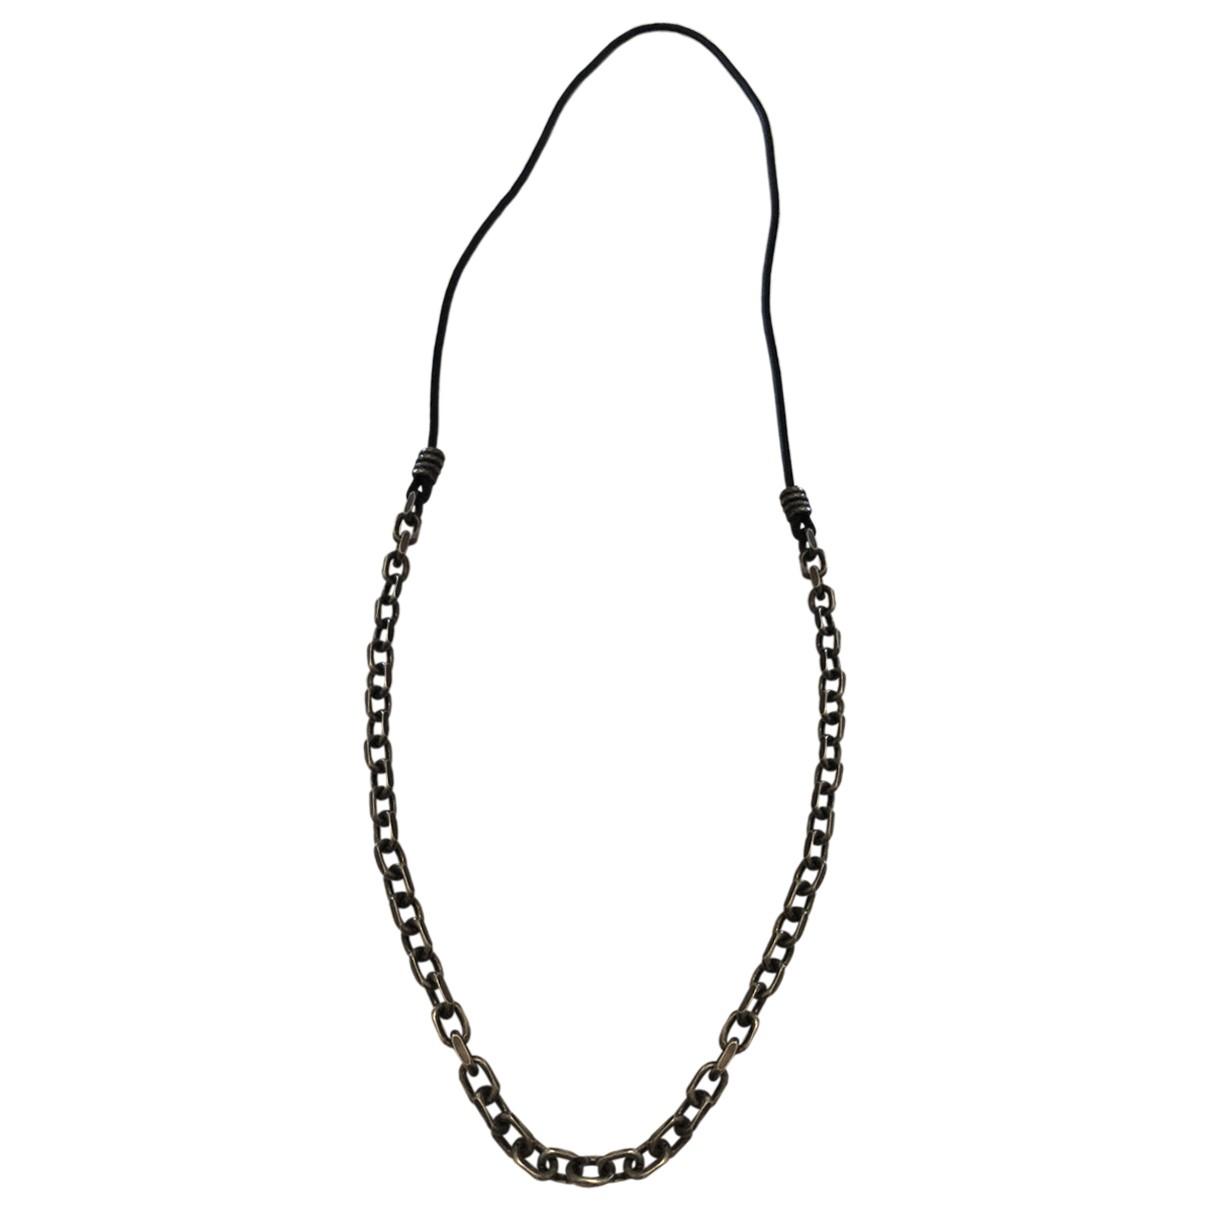 Bottega Veneta - Bijoux   pour homme en metal - noir